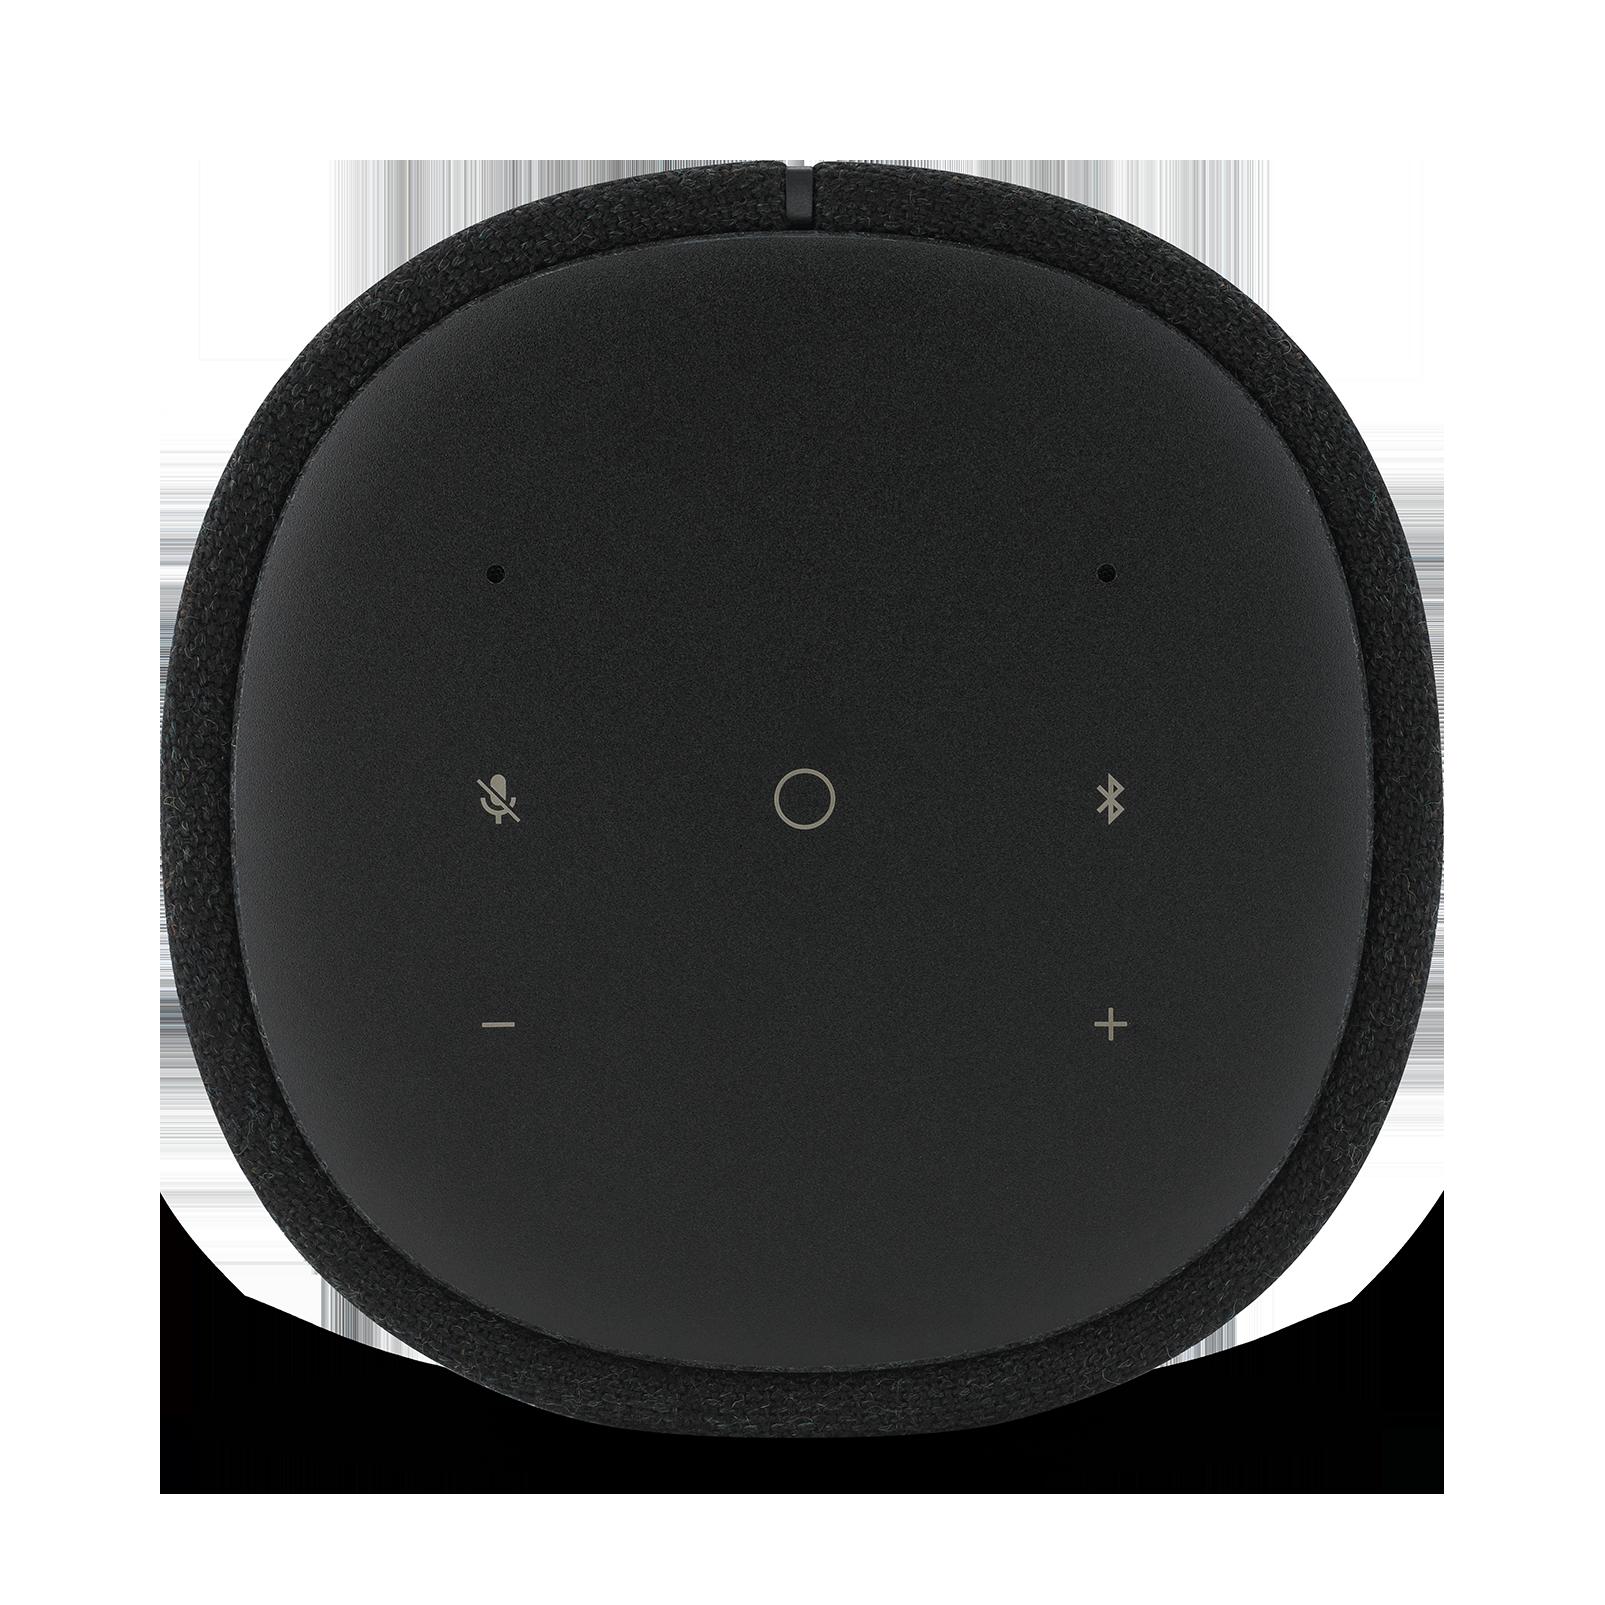 Harman Kardon Citation ONE - Black - Compact, smart and amazing sound - Detailshot 3